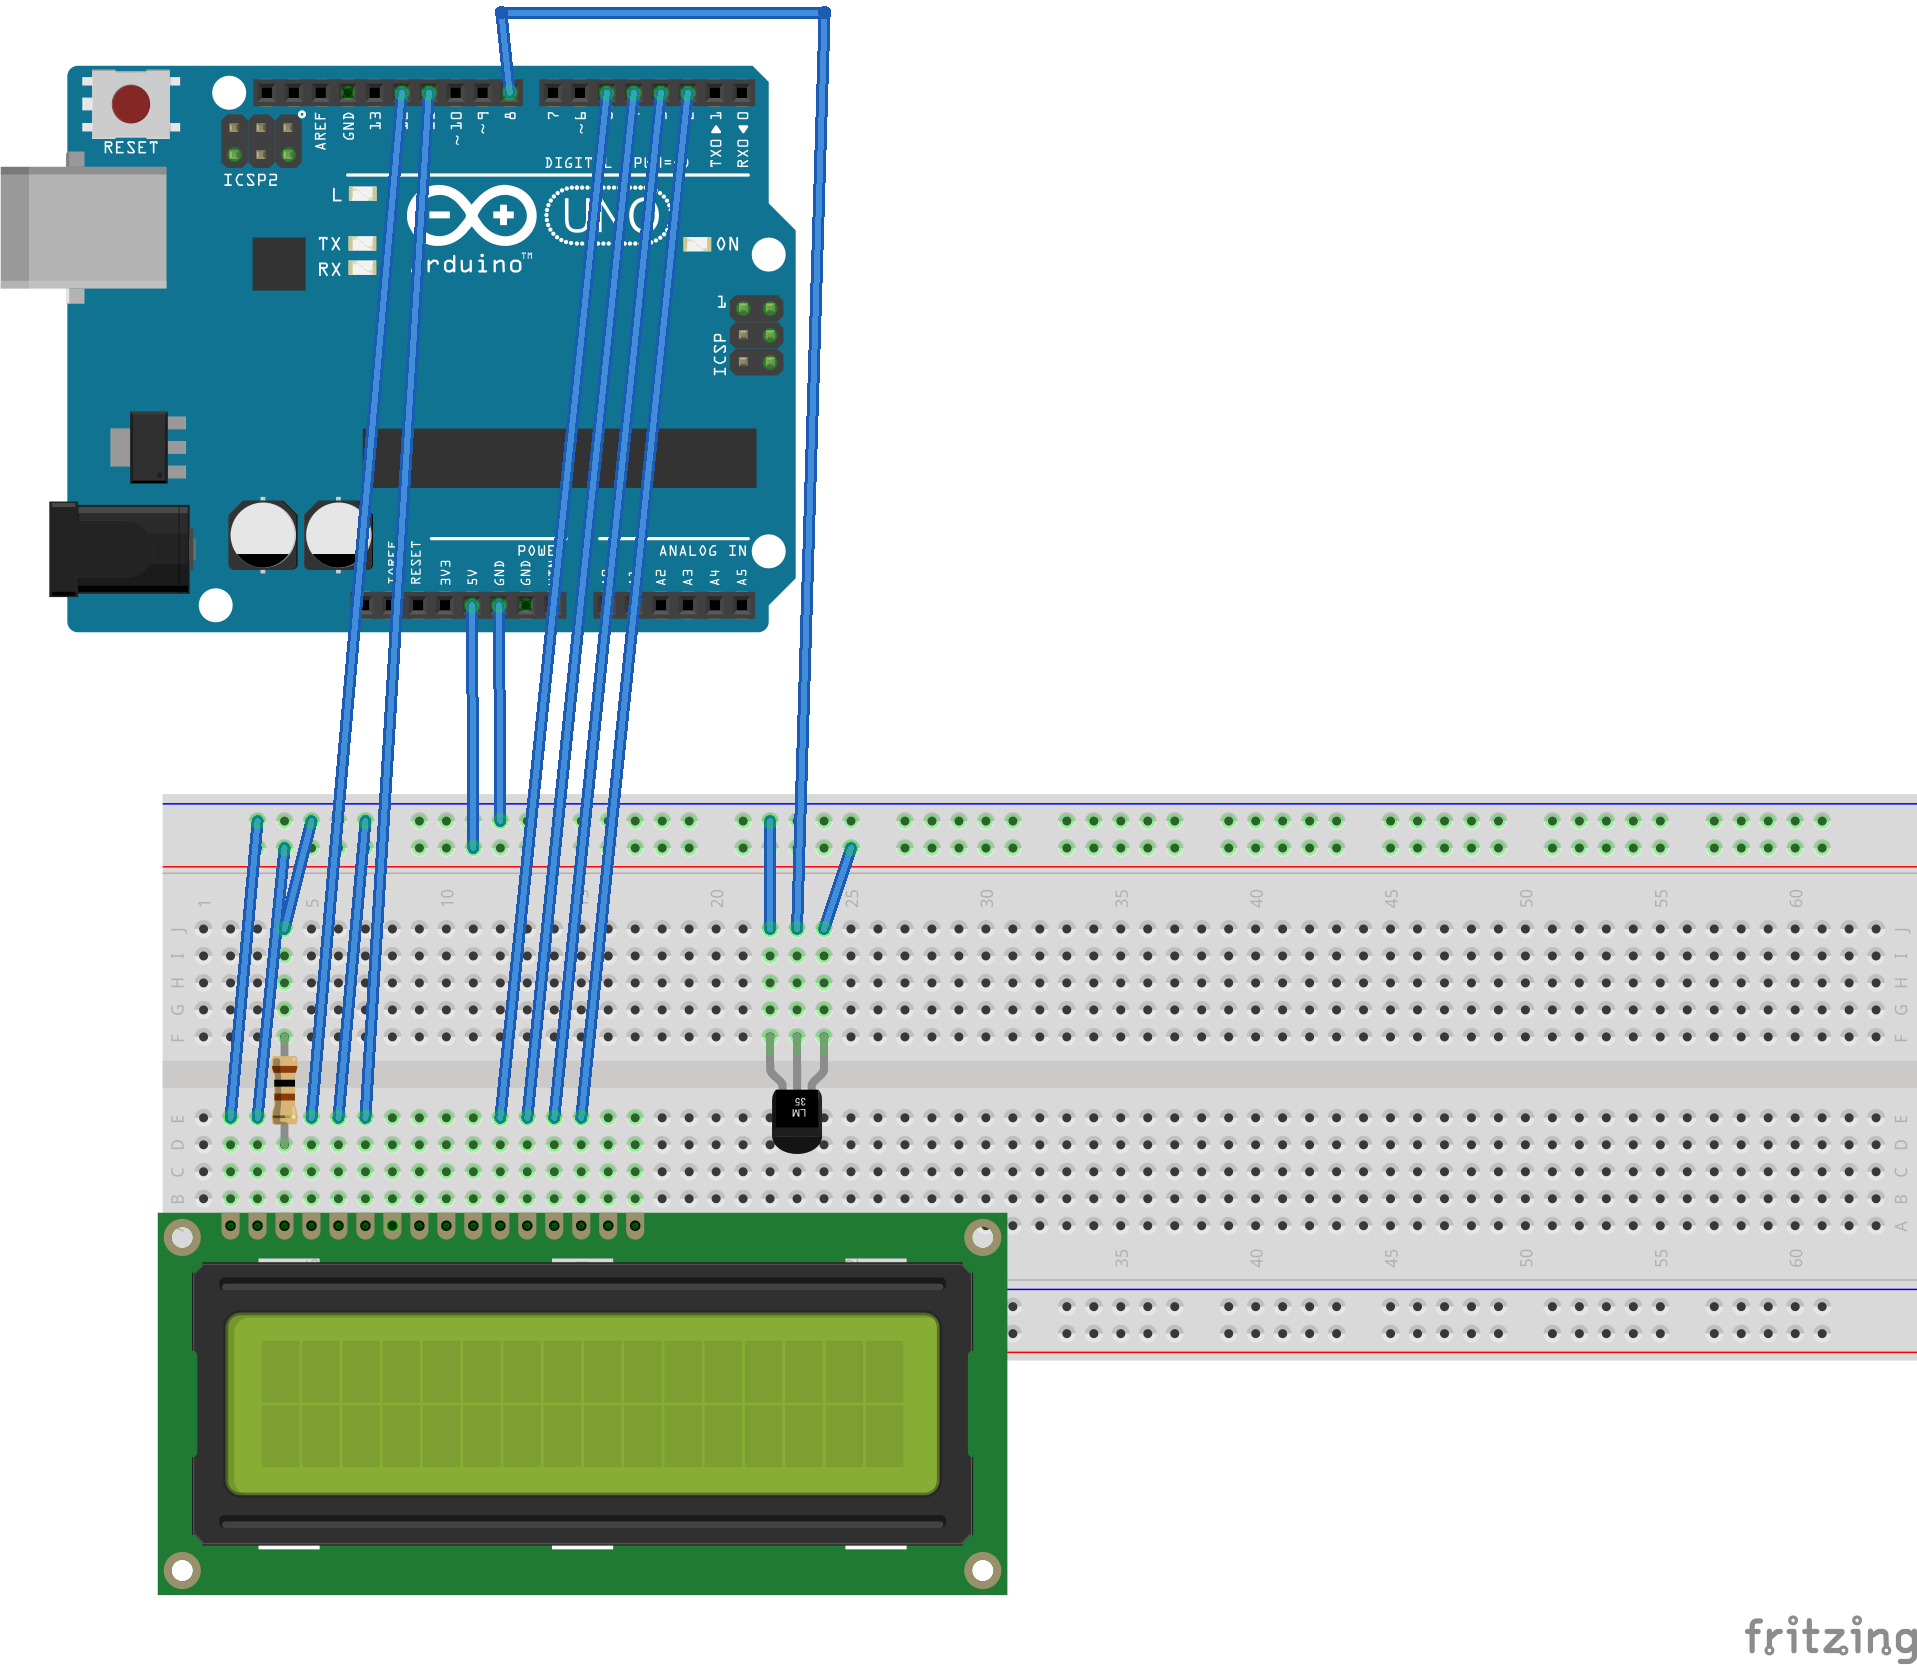 LCDディスプレイに温度湿度を表示させる_ブレッドボード.png